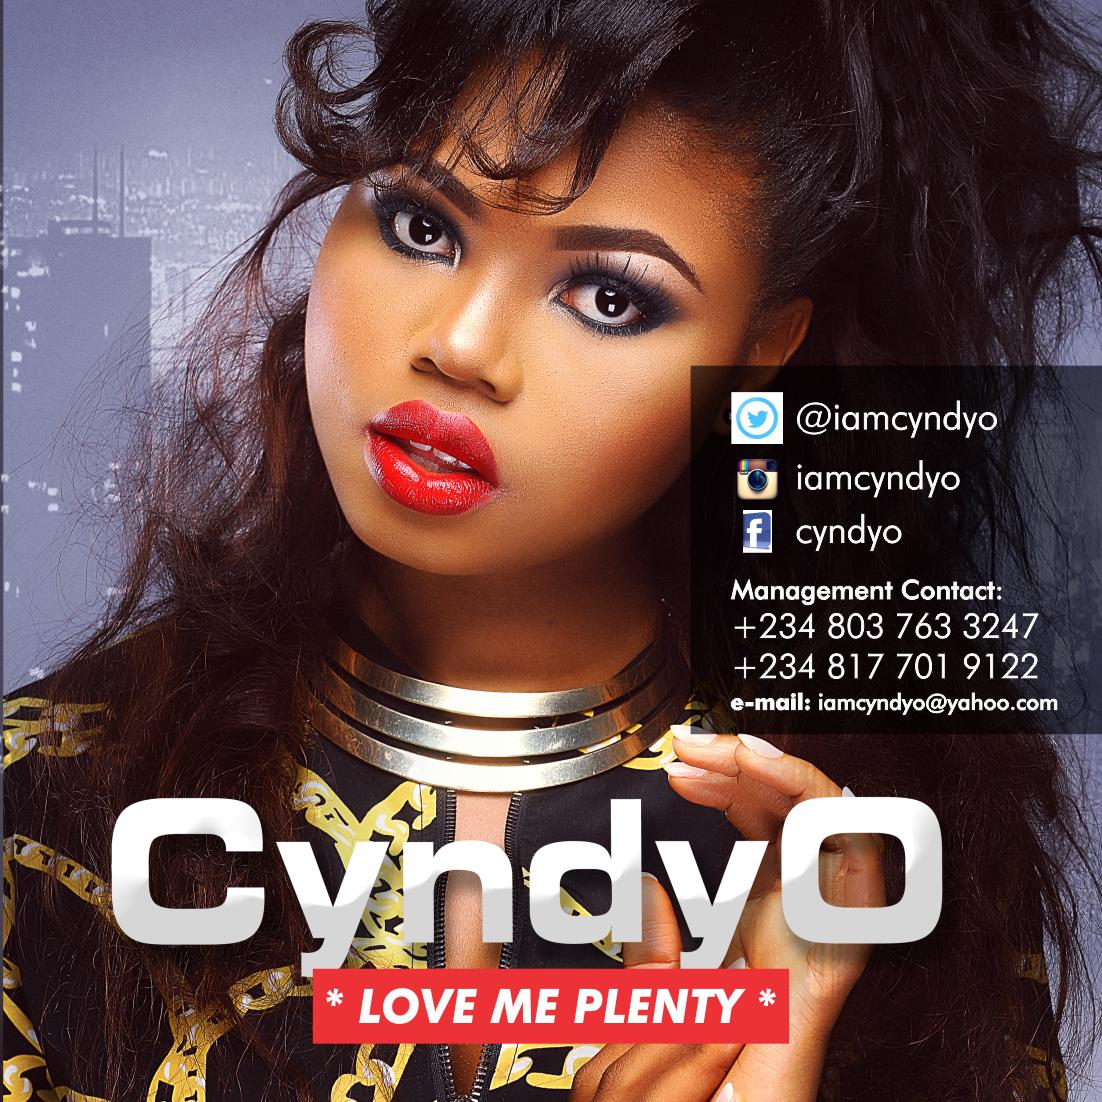 CyndyO - LoveMe Plenty-Art-tooXclusive.com